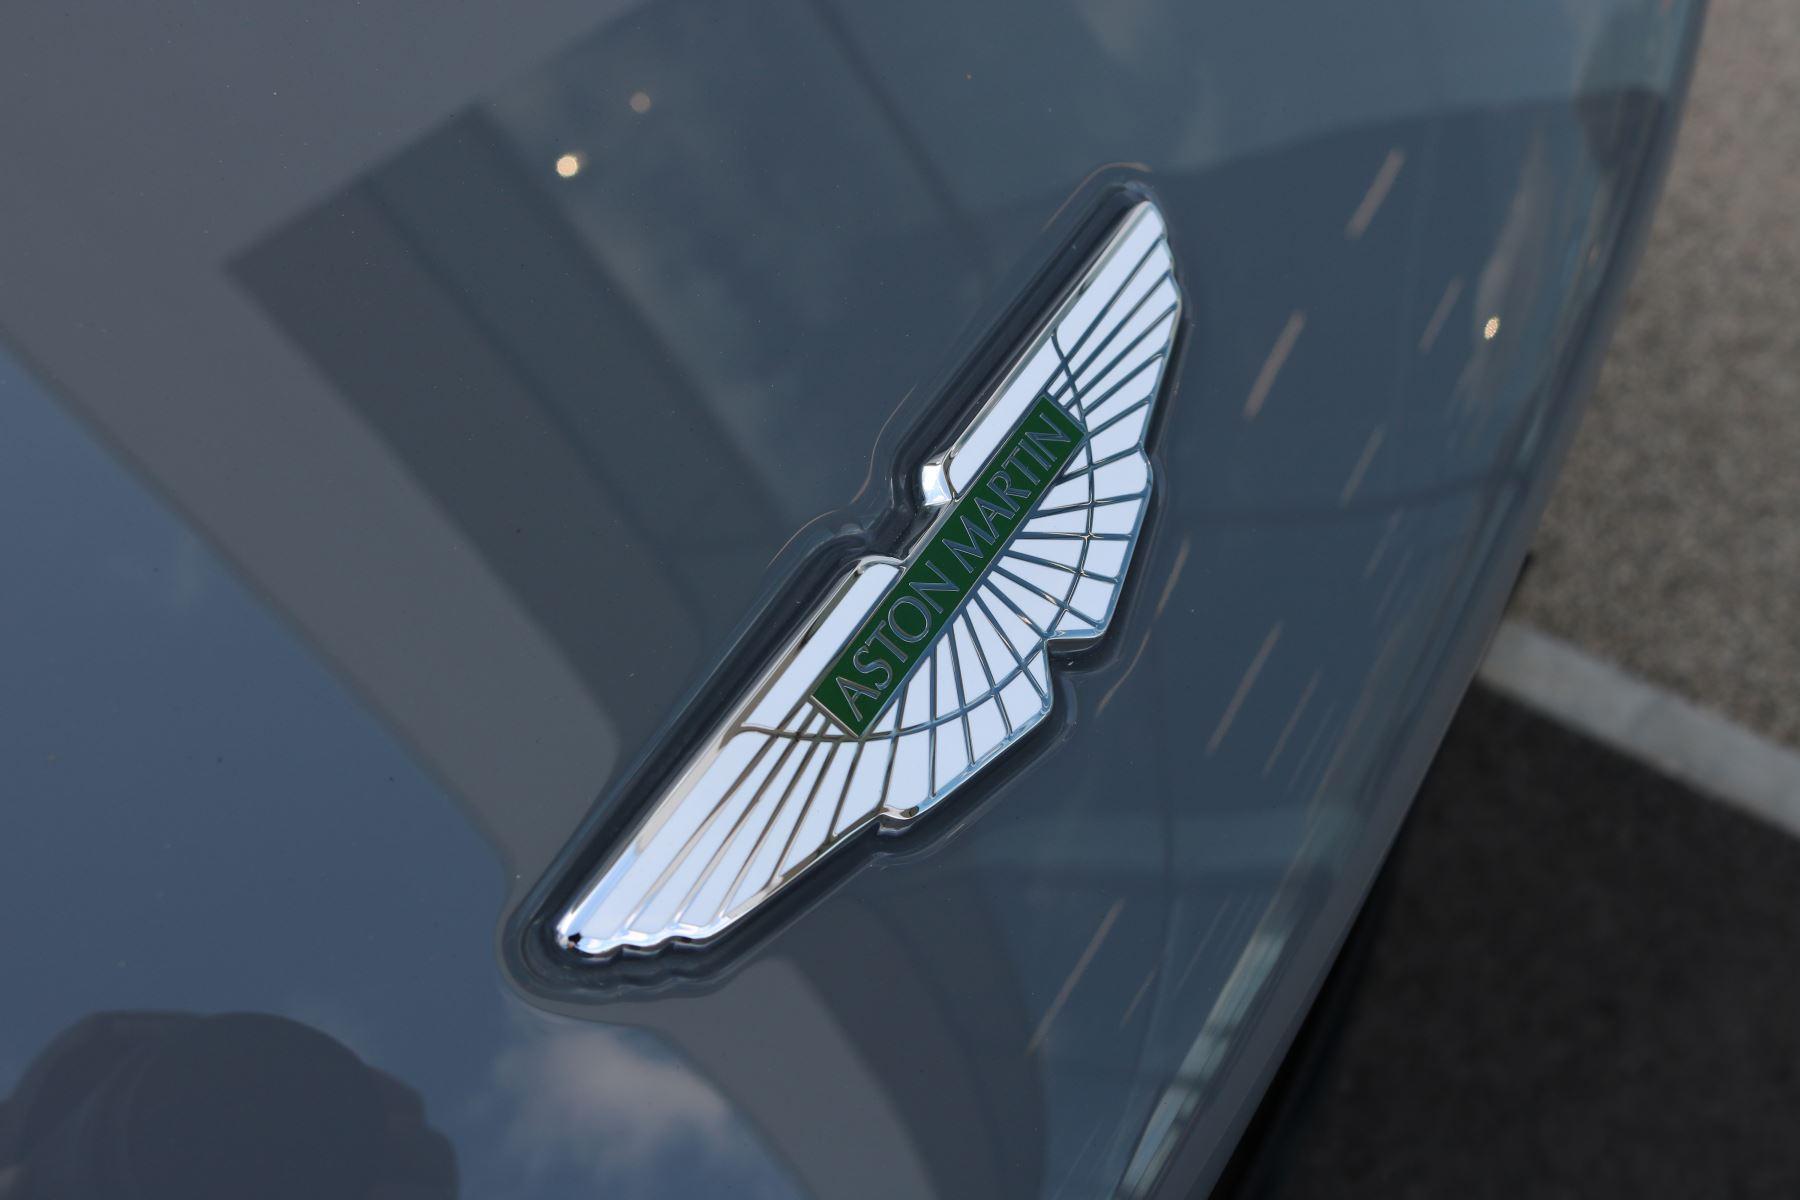 Aston Martin DB11 V12 AMR 2dr Touchtronic image 11